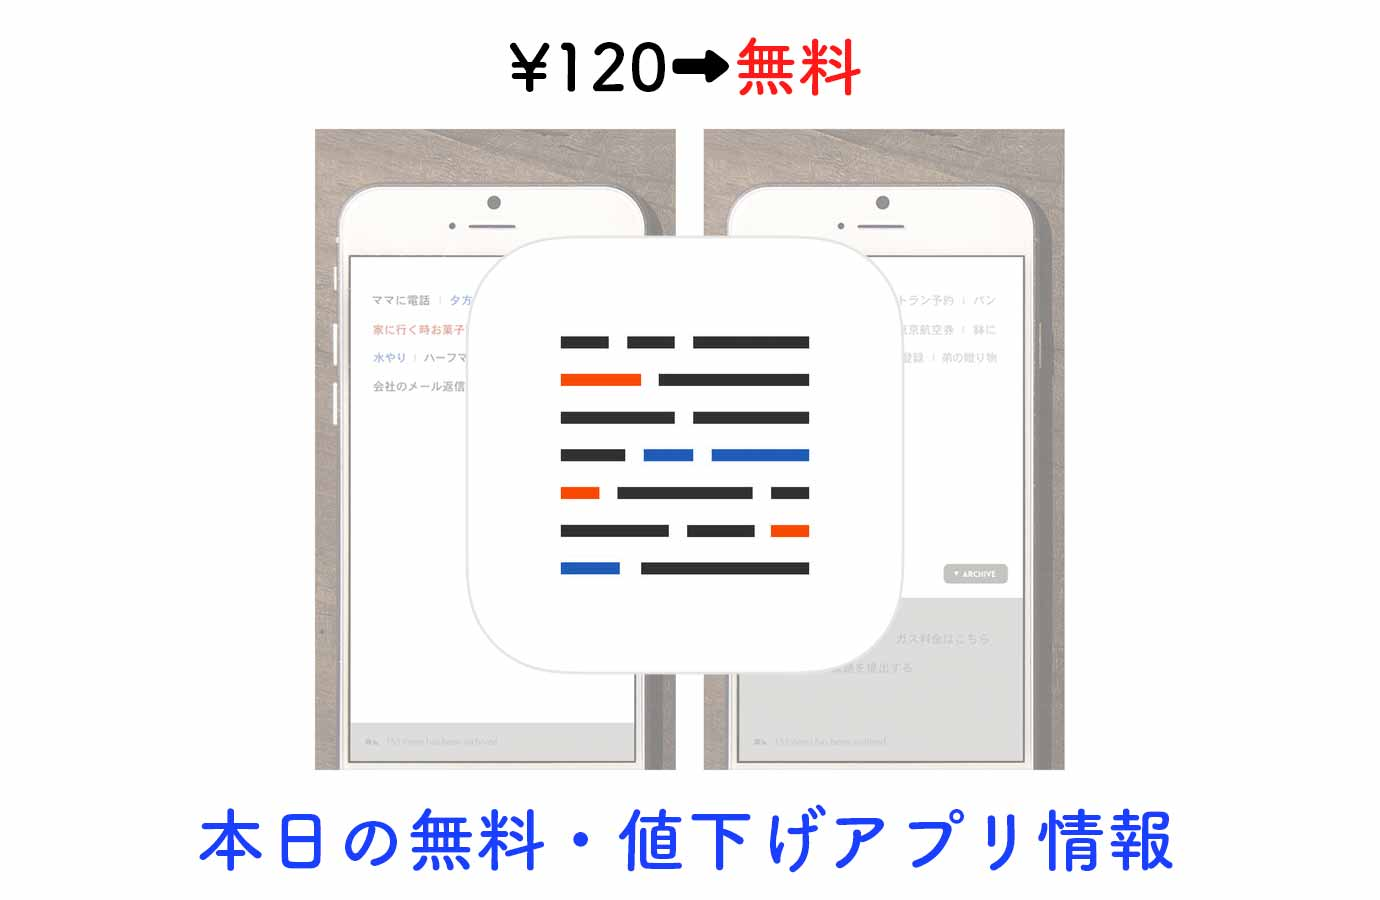 Appsale0808